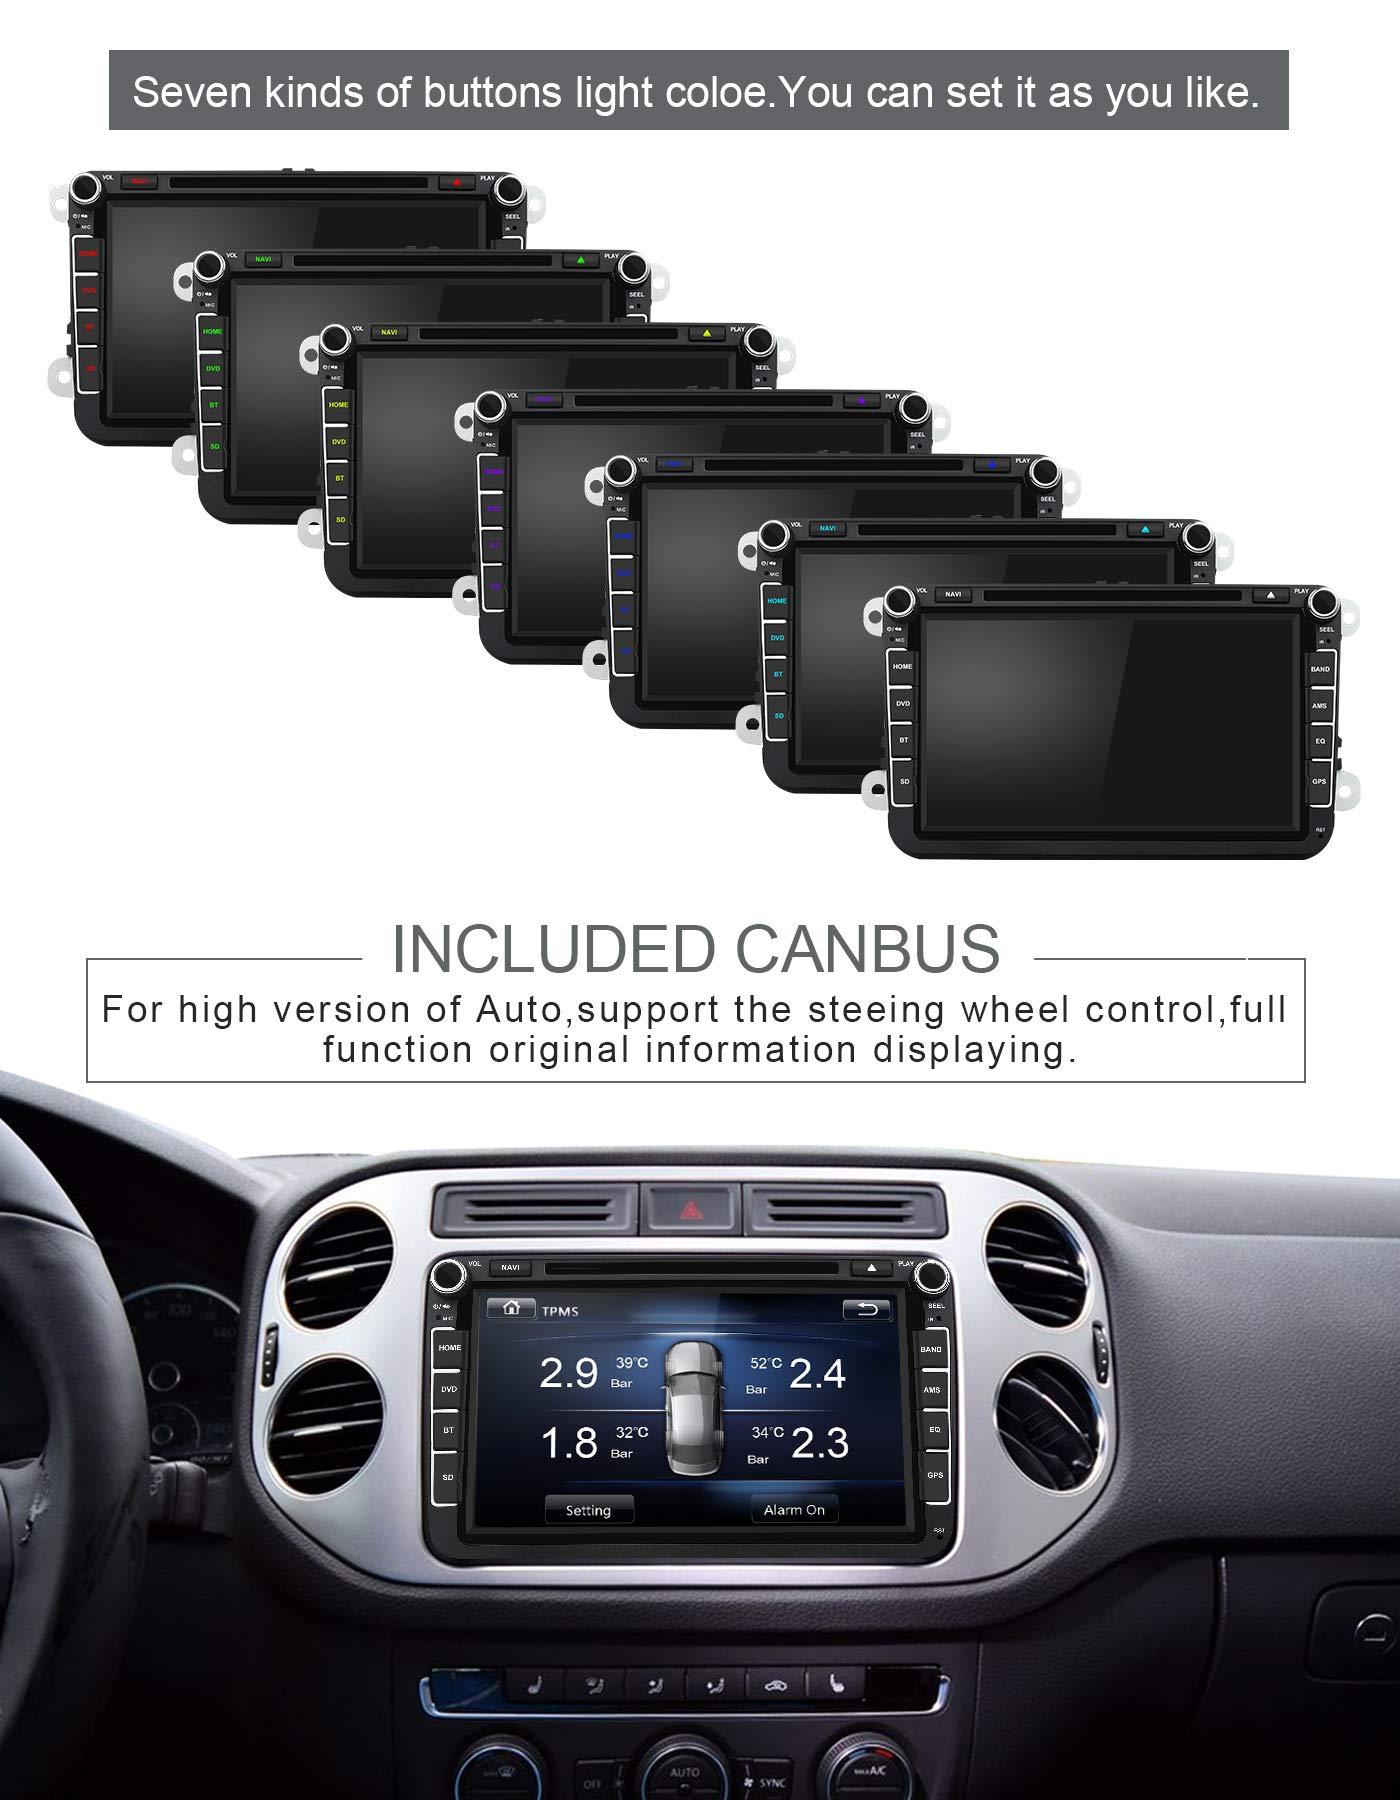 Aumume-Autoradio-fr-Golf-VW-Skoda-Seat-mit-Navi-Bluetooth-Untersttzung-GPS-Navigation-Radio-Parkkamera-Lenkradsteuerung-mit-8-GB-Karte